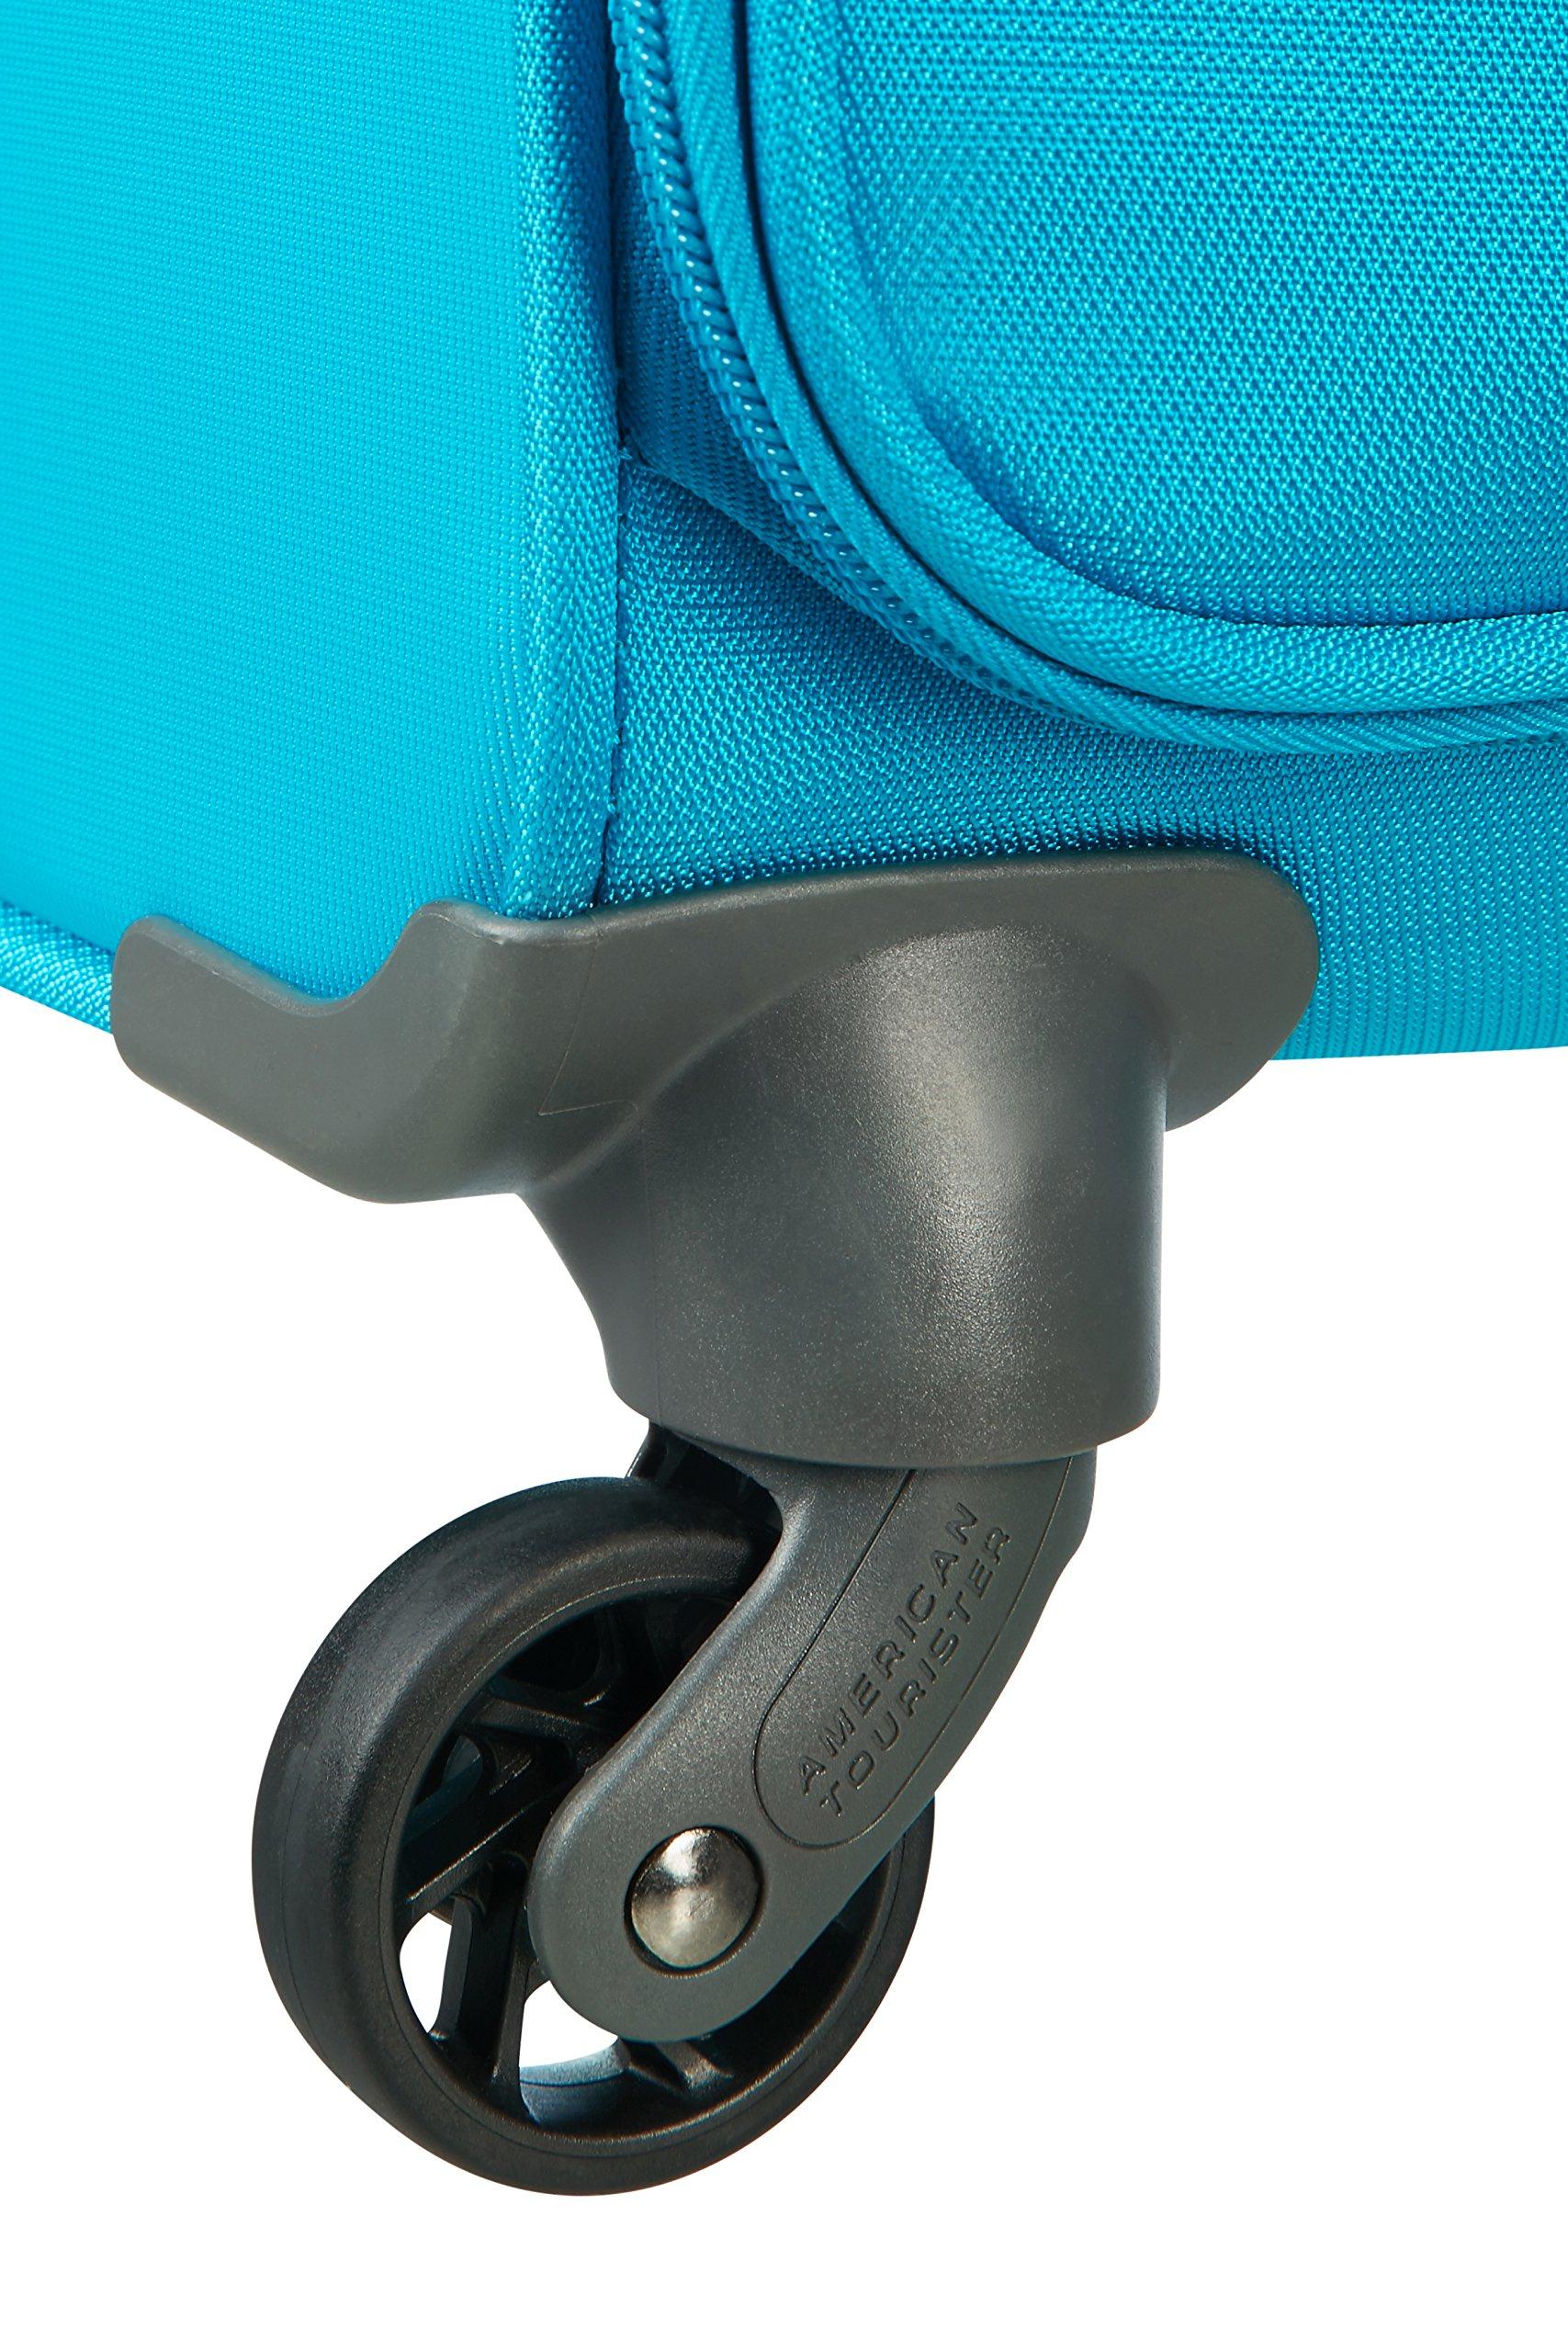 911dx KgqFL - American Tourister Herolite Maleta, Azul (MIDNIGHT BLUE), S EXP (55cm-42L)